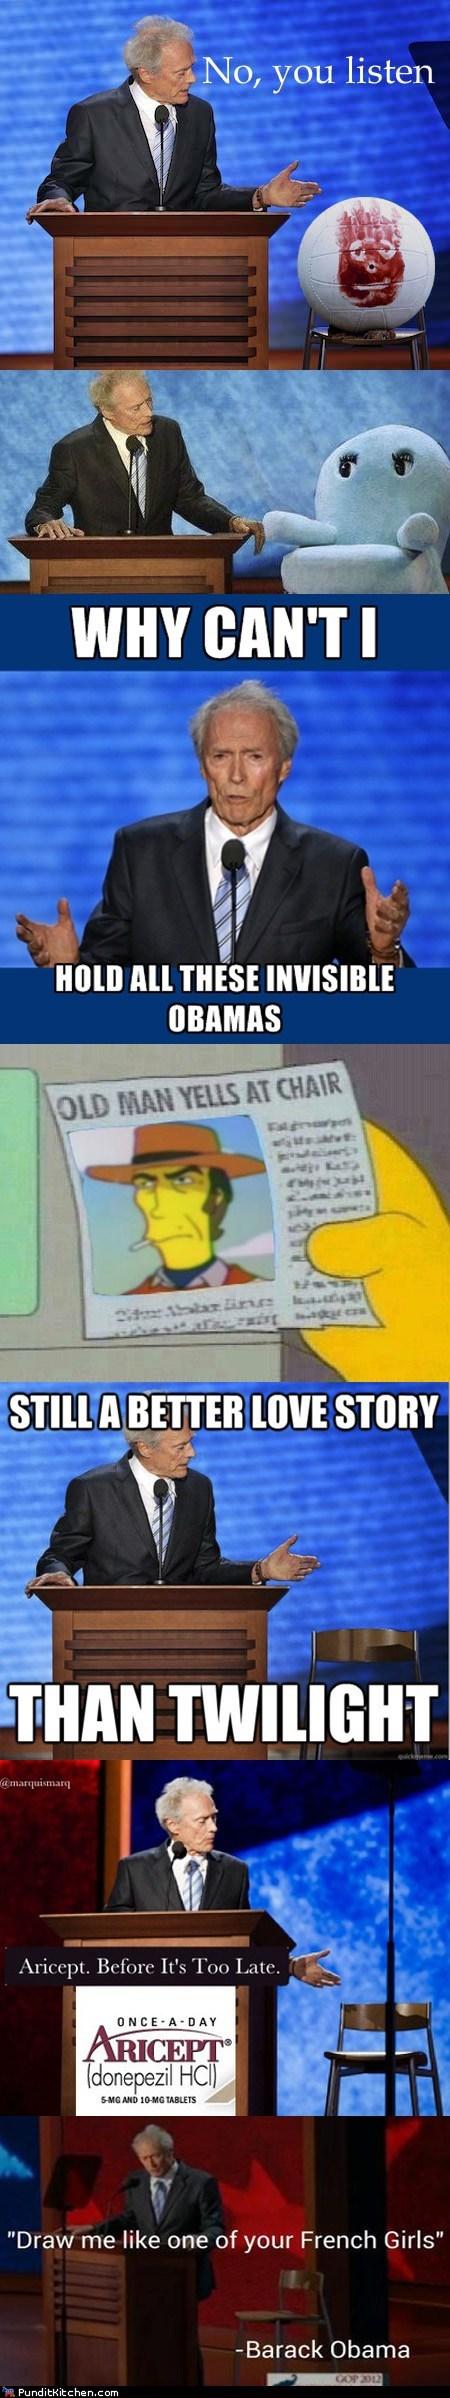 Clint Eastwood internet Memes response rnc - 6554885376